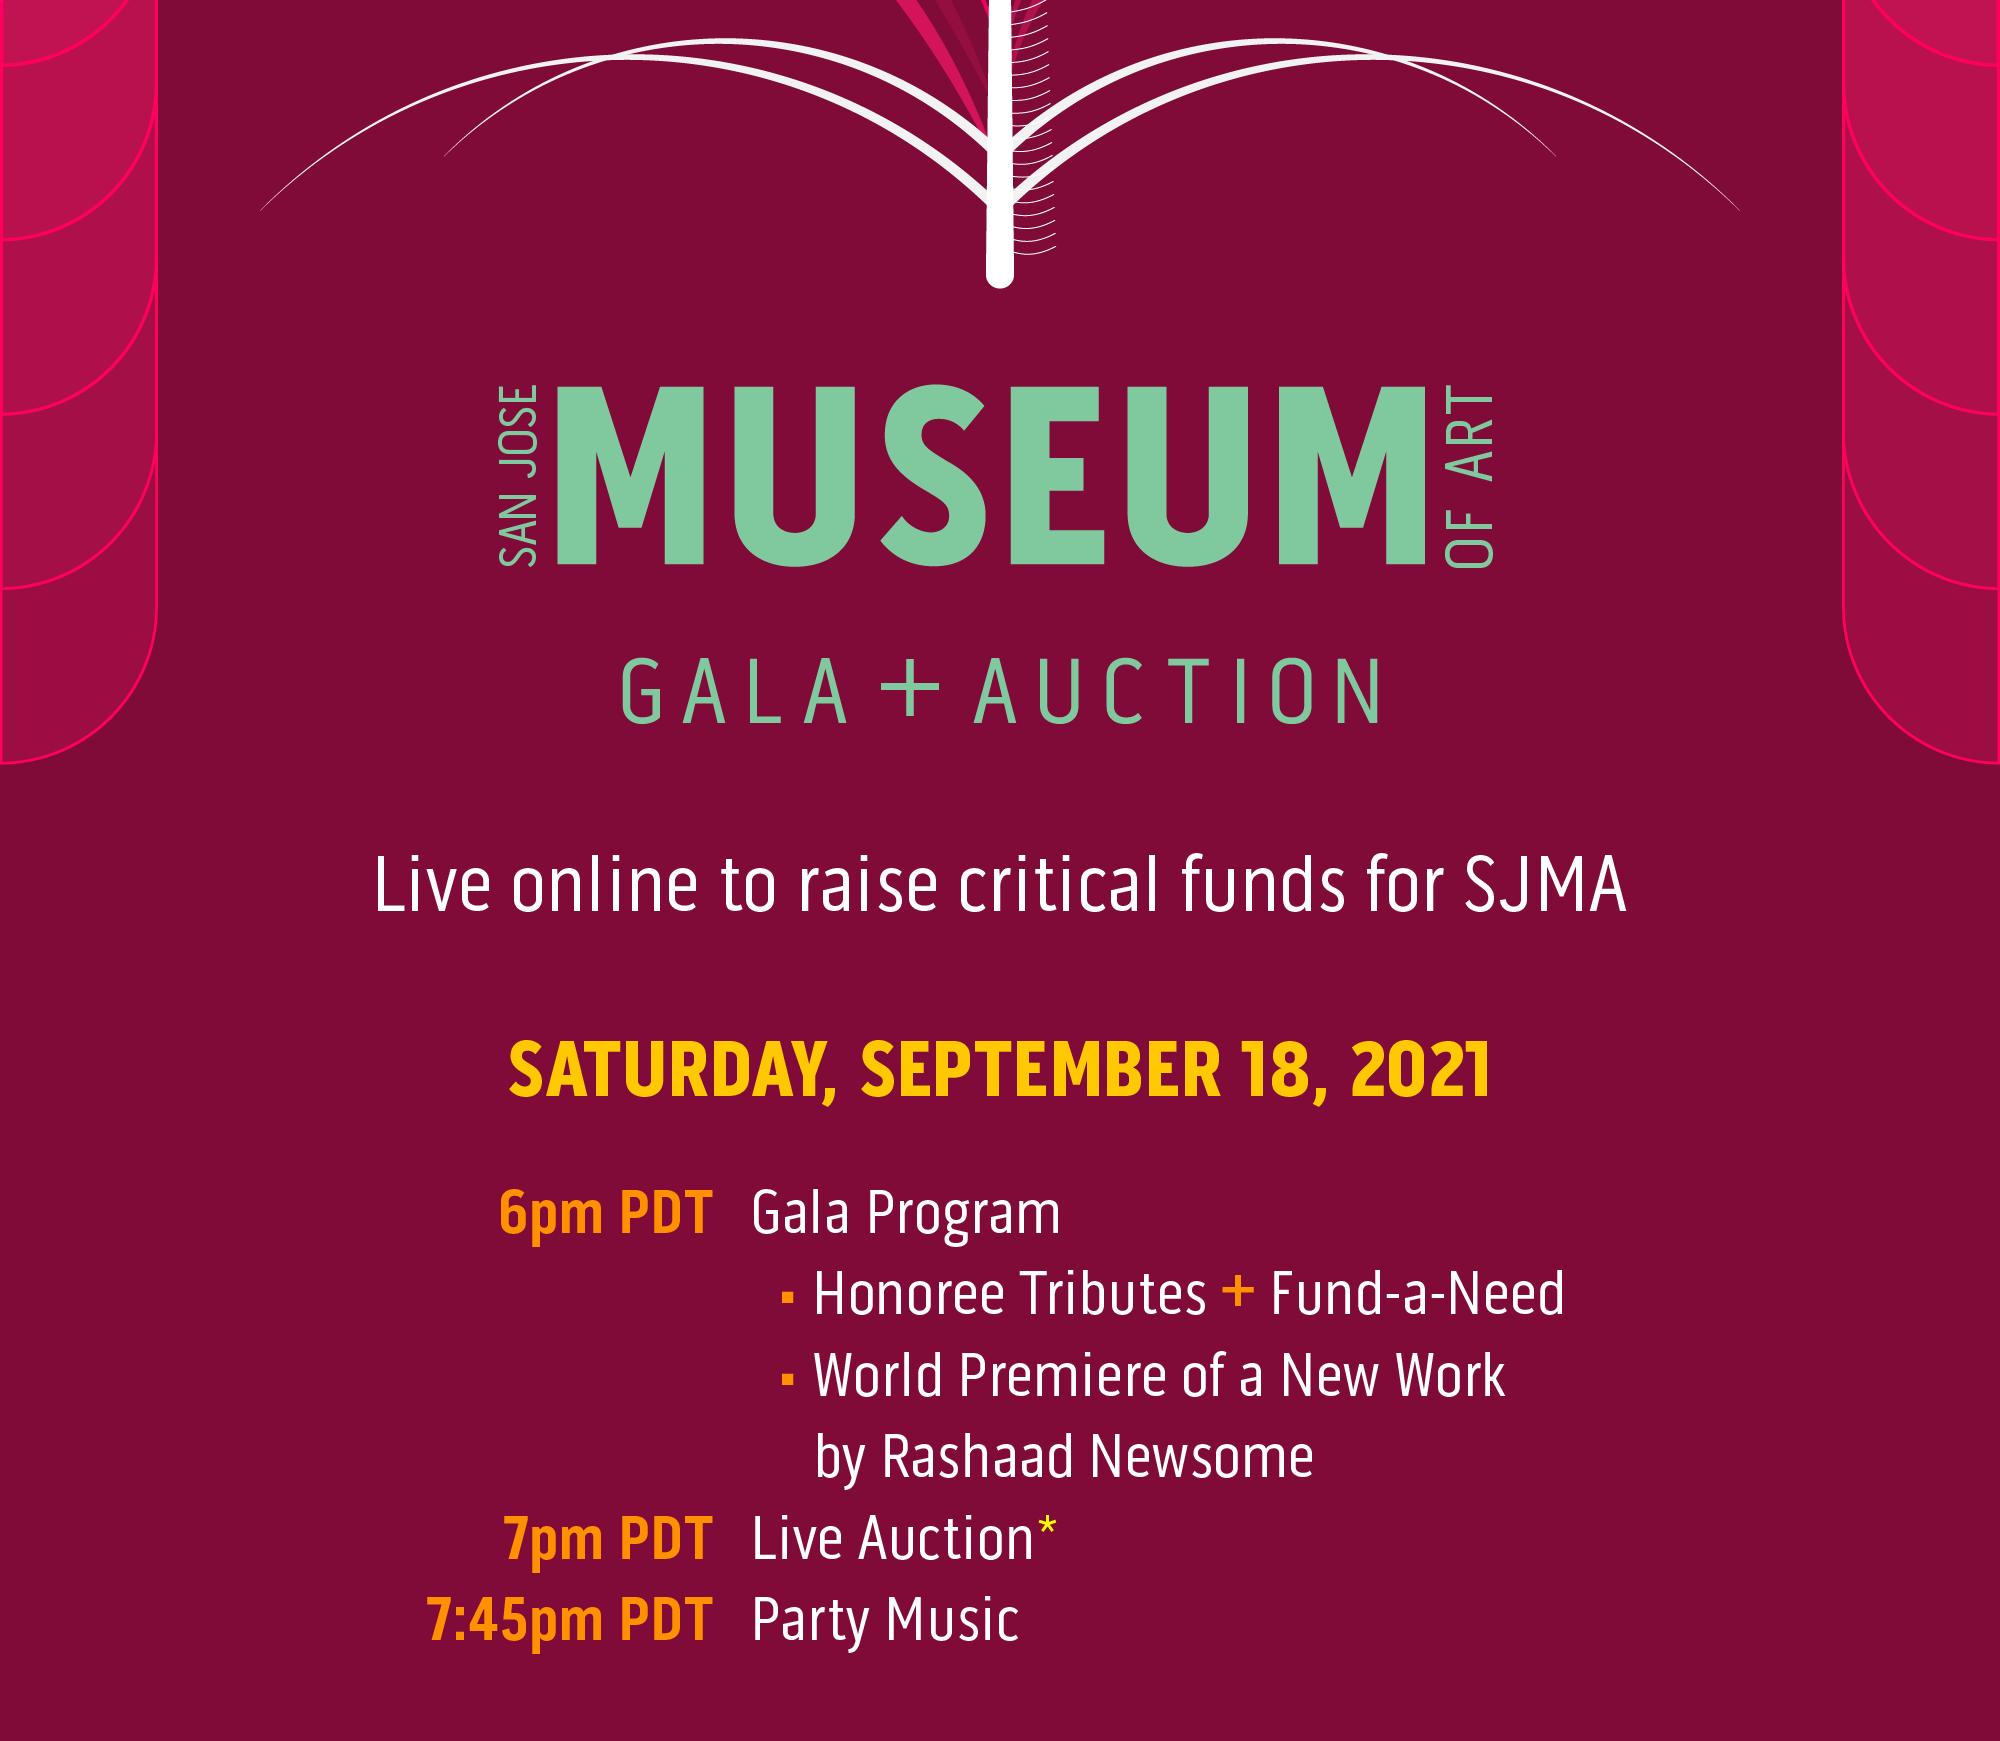 2021 Gala + Auction